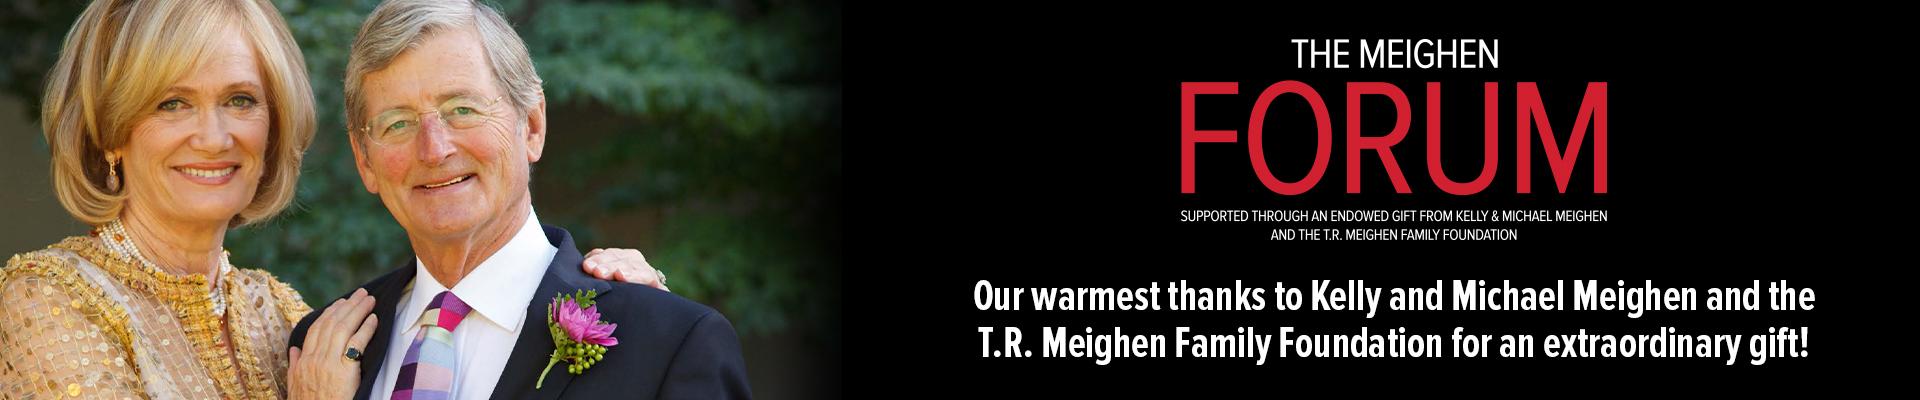 Announcement of The Meighen Forum